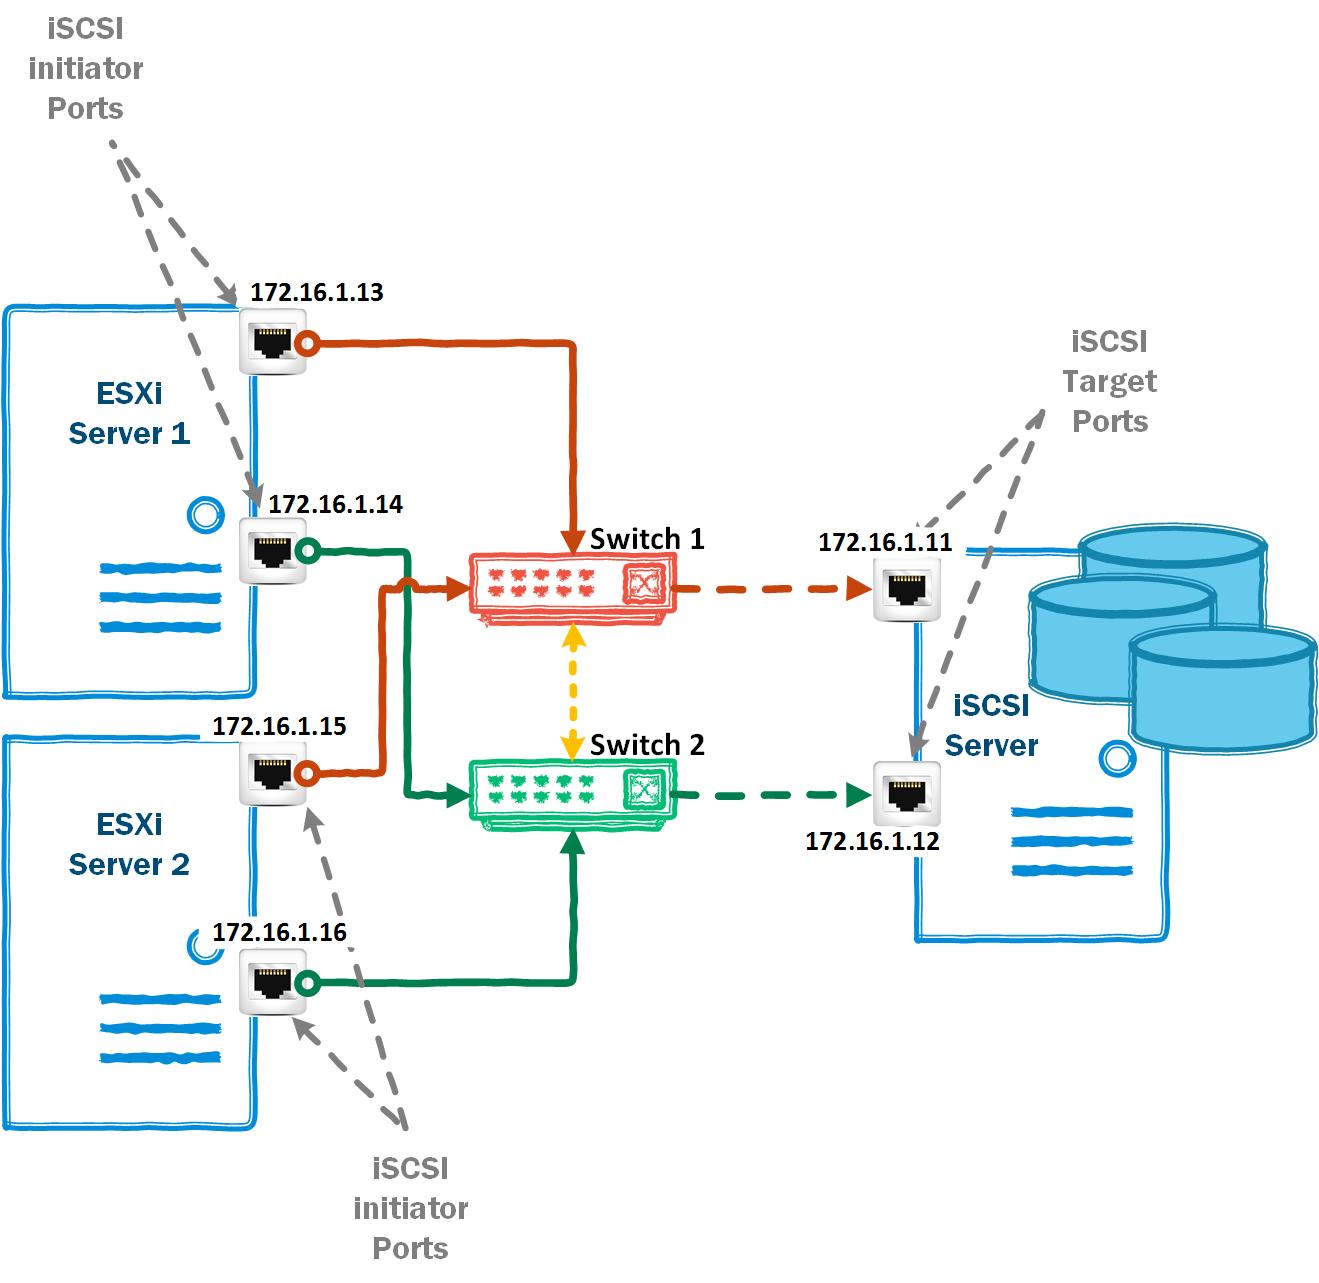 vGeek: Configuring Microsoft iSCSI Target datastore on Esxi server ...